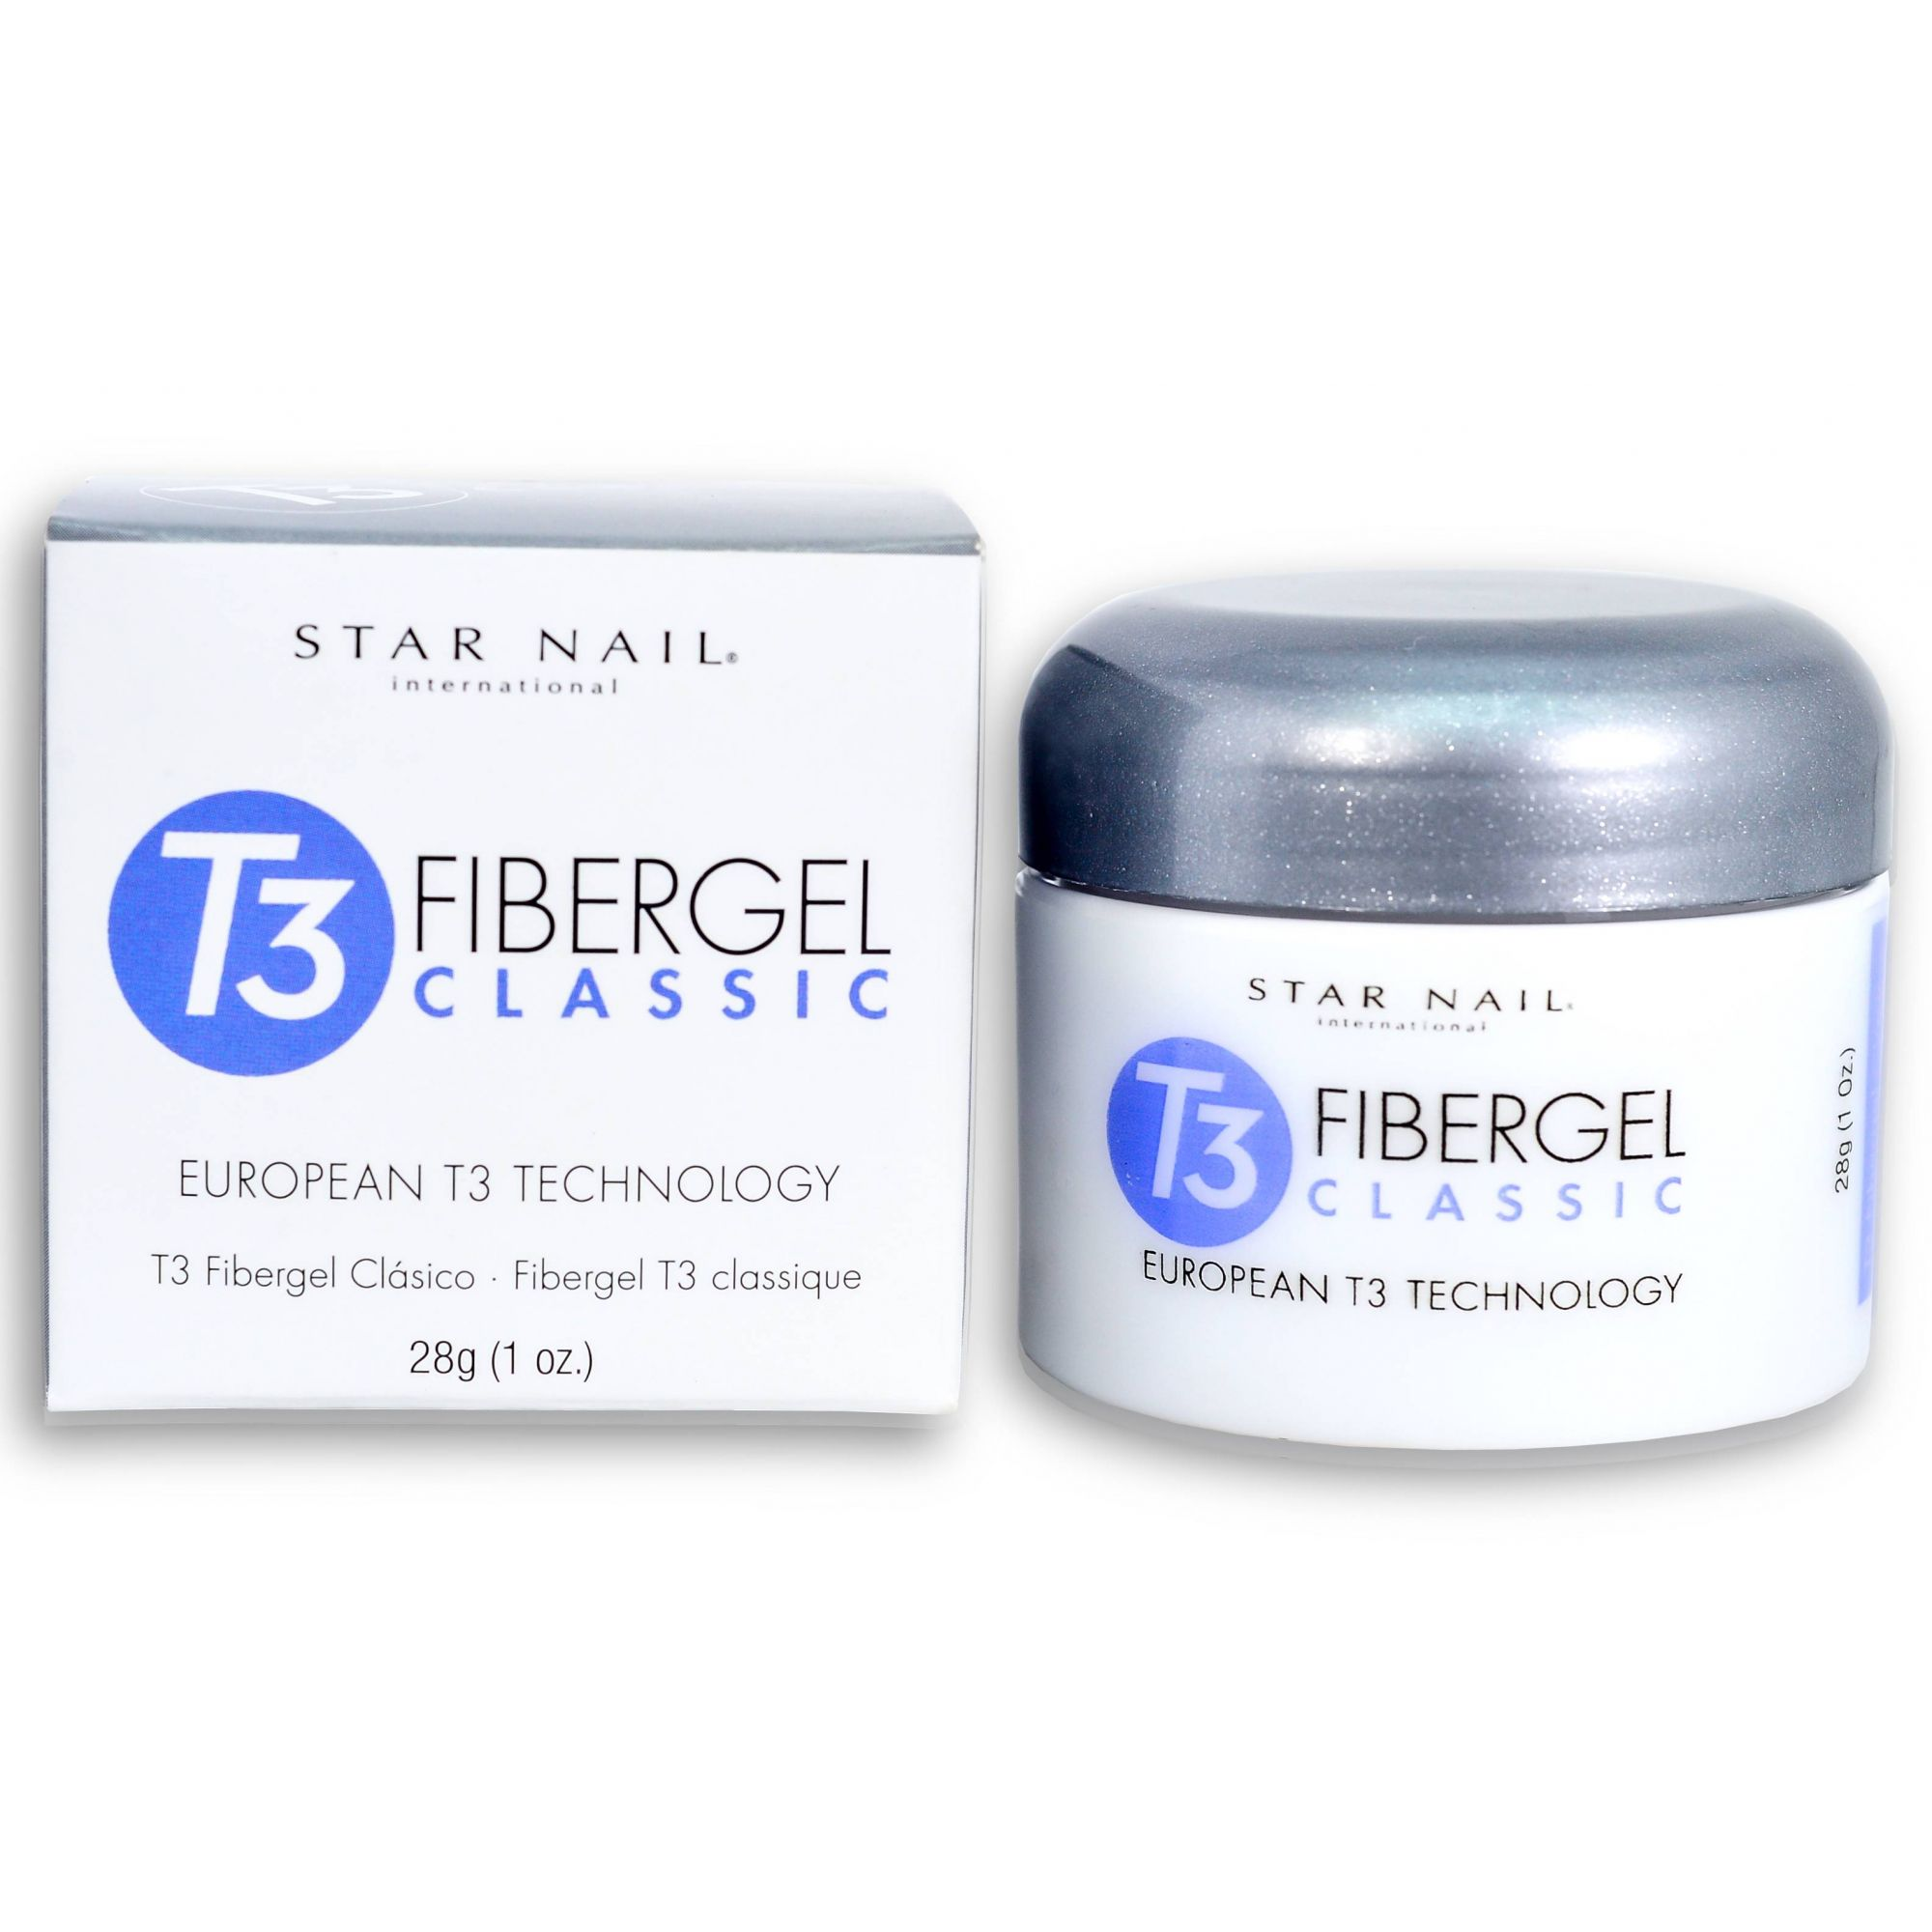 CUCCIO Gel para unhas Star Nail T3 Uv Fibergel PINK  - Sílvia Pedrarias & Cia